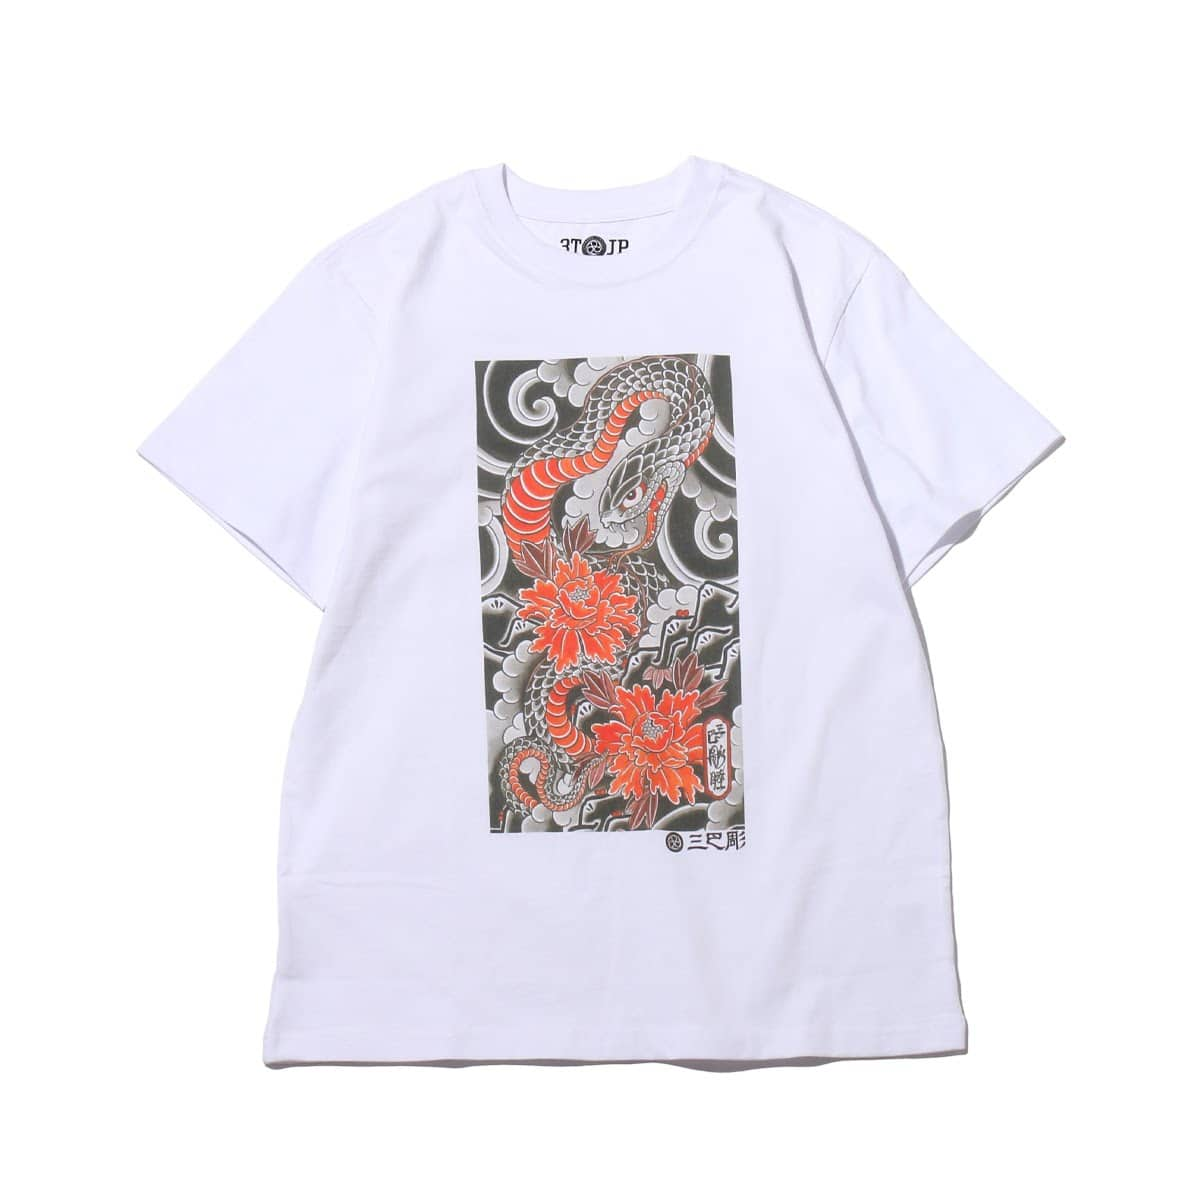 "UBIQ ""IREZUMI"" T-SHIRT  (Hevi & Botan) Designed by MUTSUO  WHITE_photo_large"